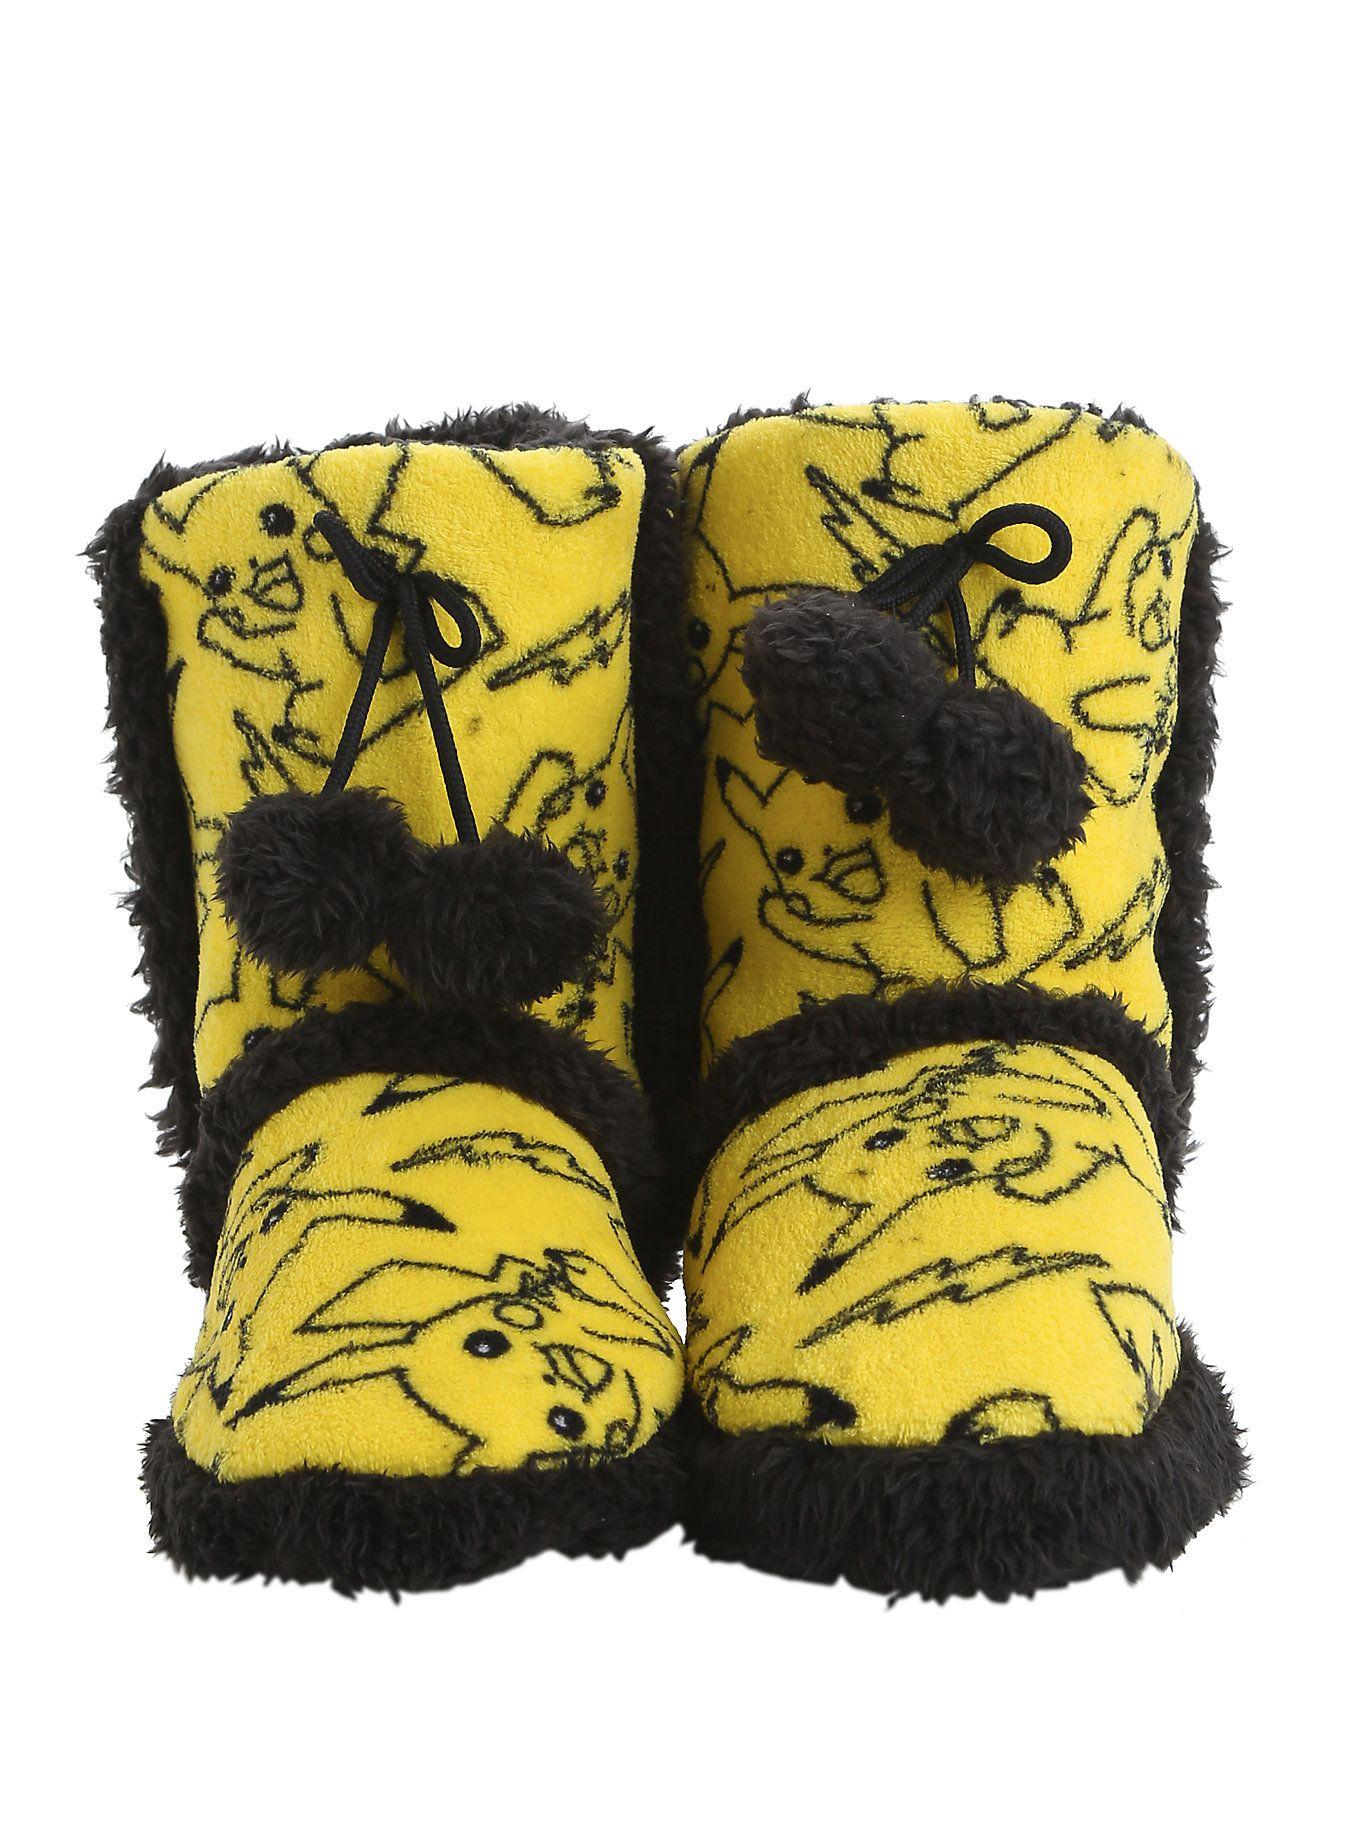 61126bb1398638 Pokemon Pikachu Knit Pom Slipper Boots   Pin of the Day   Slipper ...